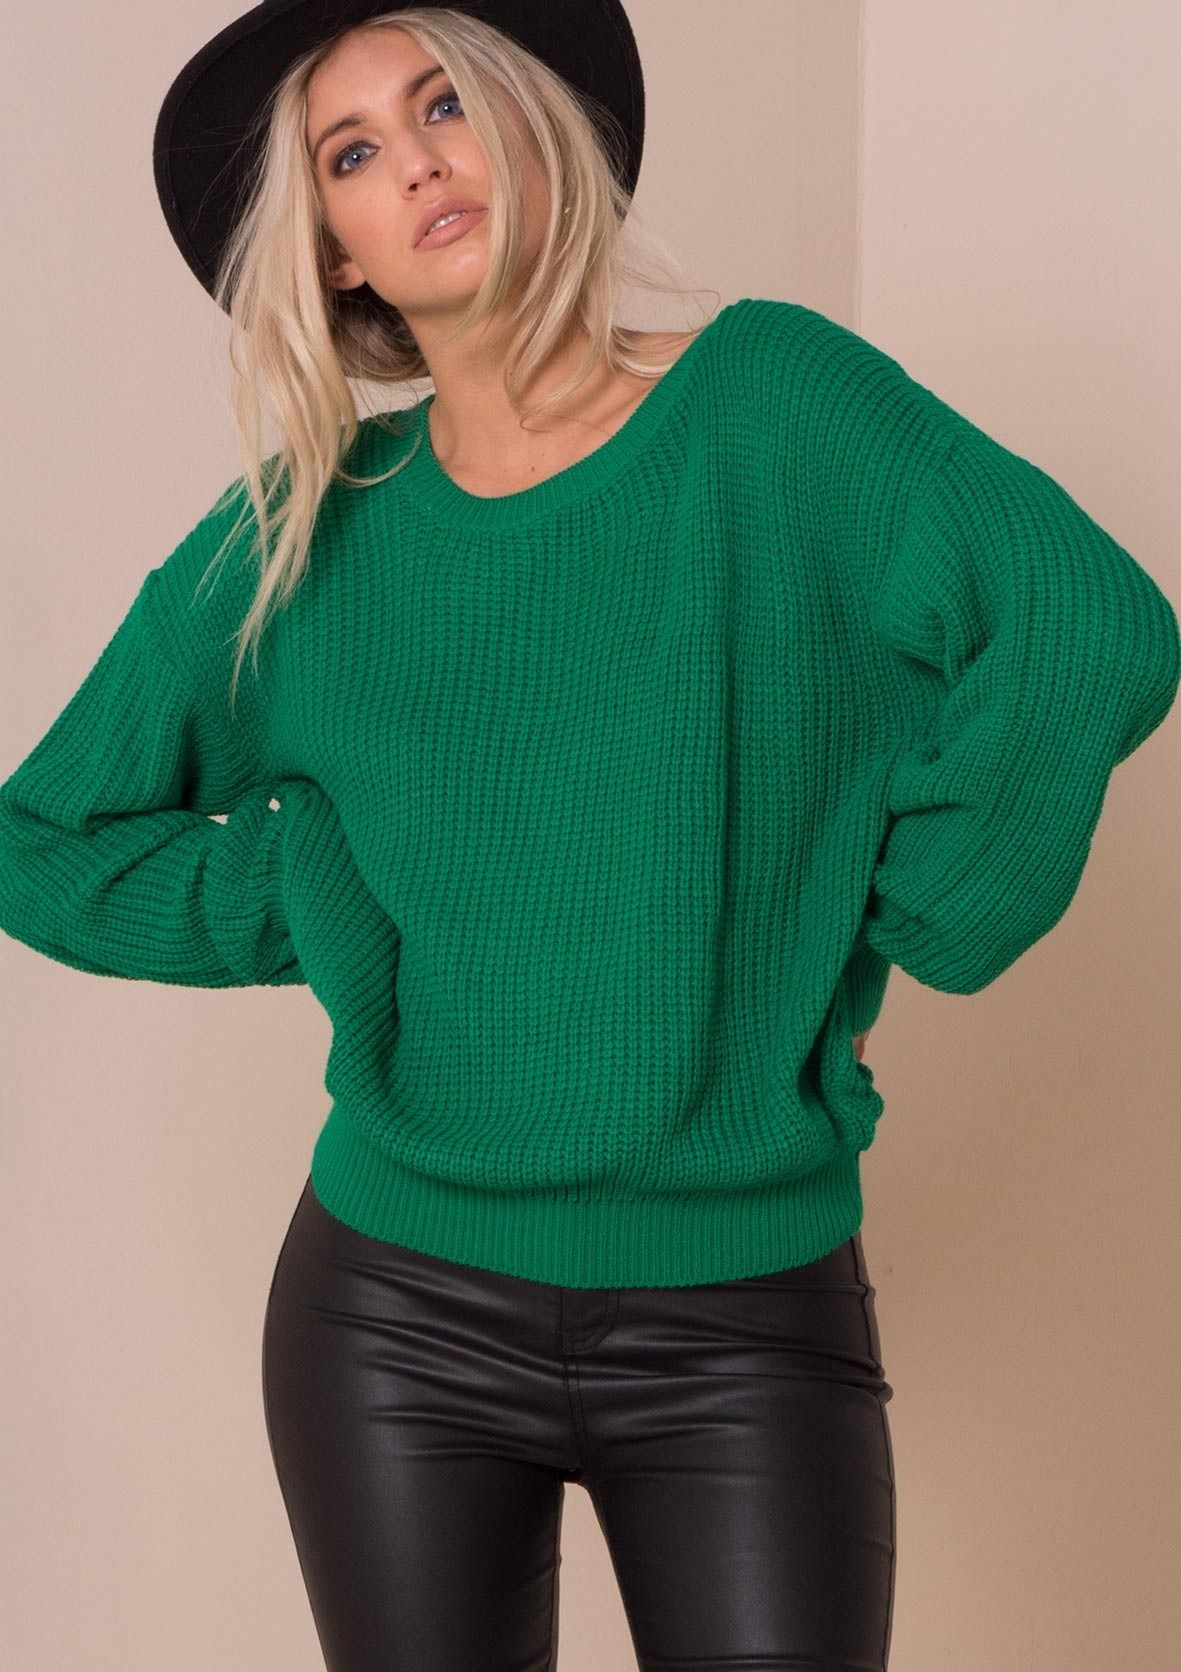 Mysha Green Fisherman Knit Baggy Jumper   Tops   Pinterest ...